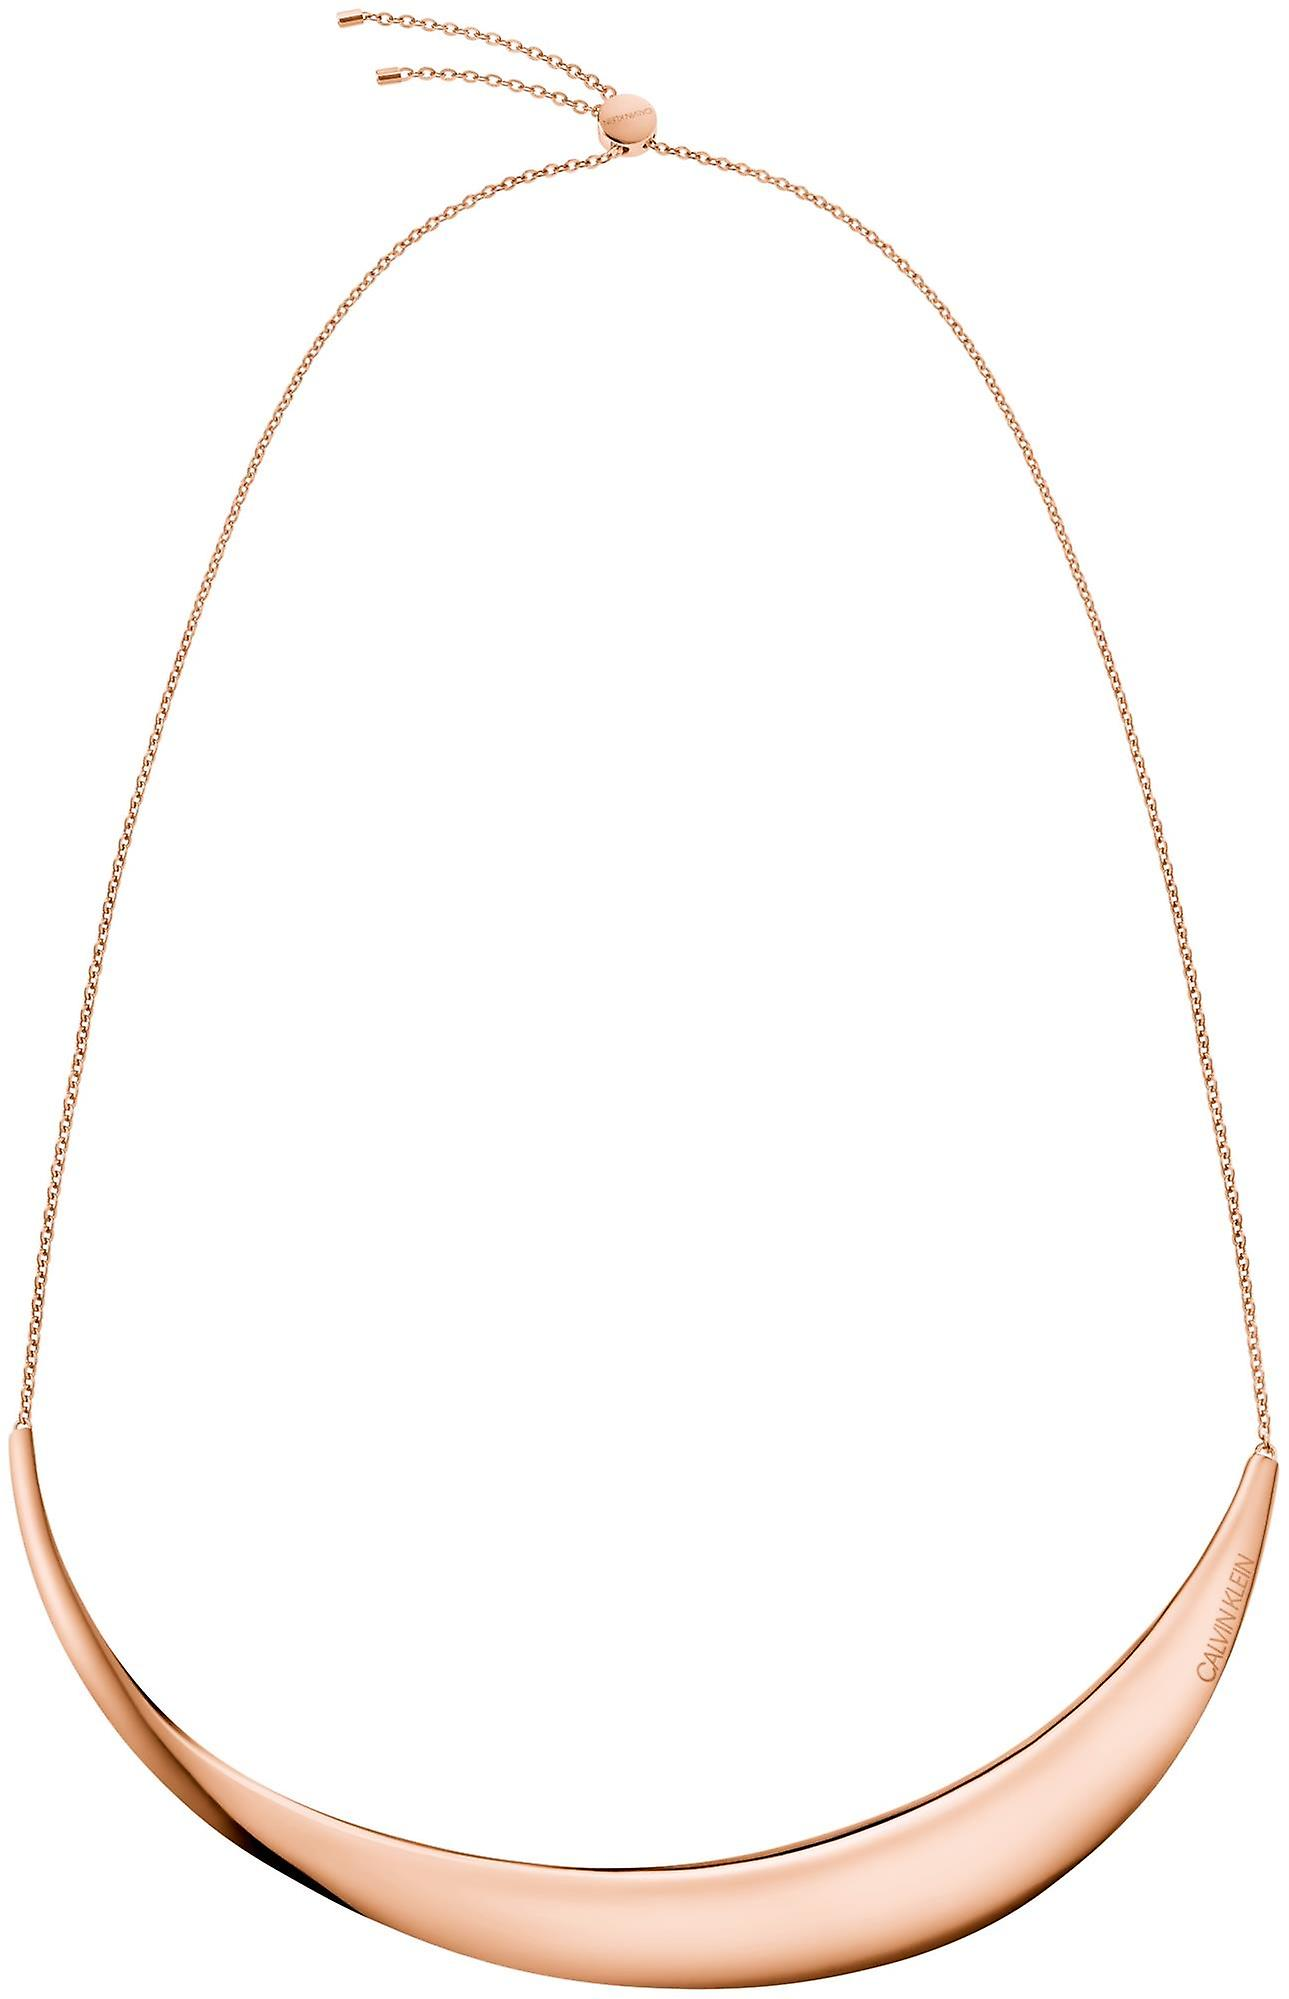 Calvin Klein Groovy Rose Gold Stainless Steel Ladies Choker Necklace KJ8QPJ100100